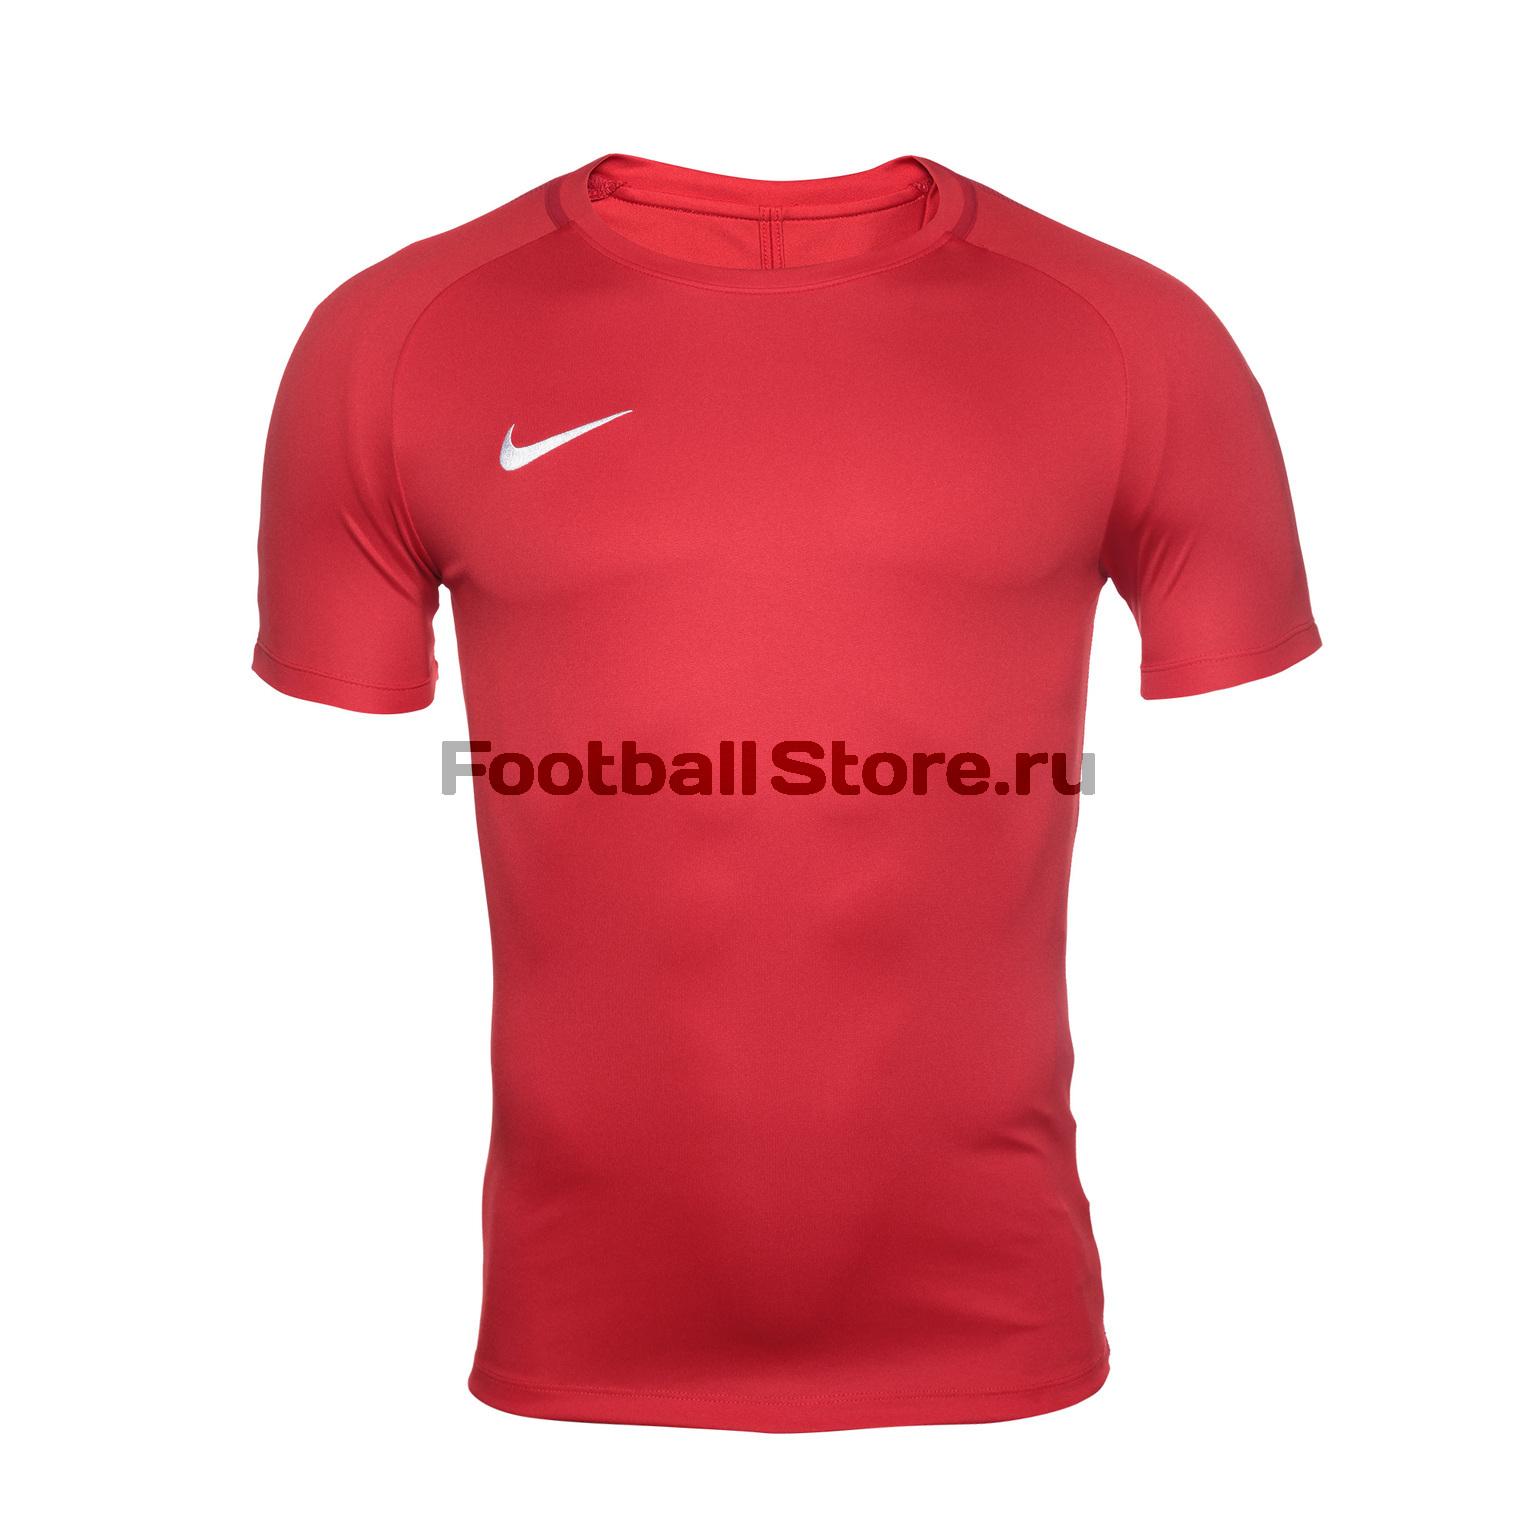 Футболки Nike Футболка тренировочная Nike Dry Academy18 Top SS 893693-657 игровая форма nike футболка детская nike ss precision iii jsy boys 645918 410